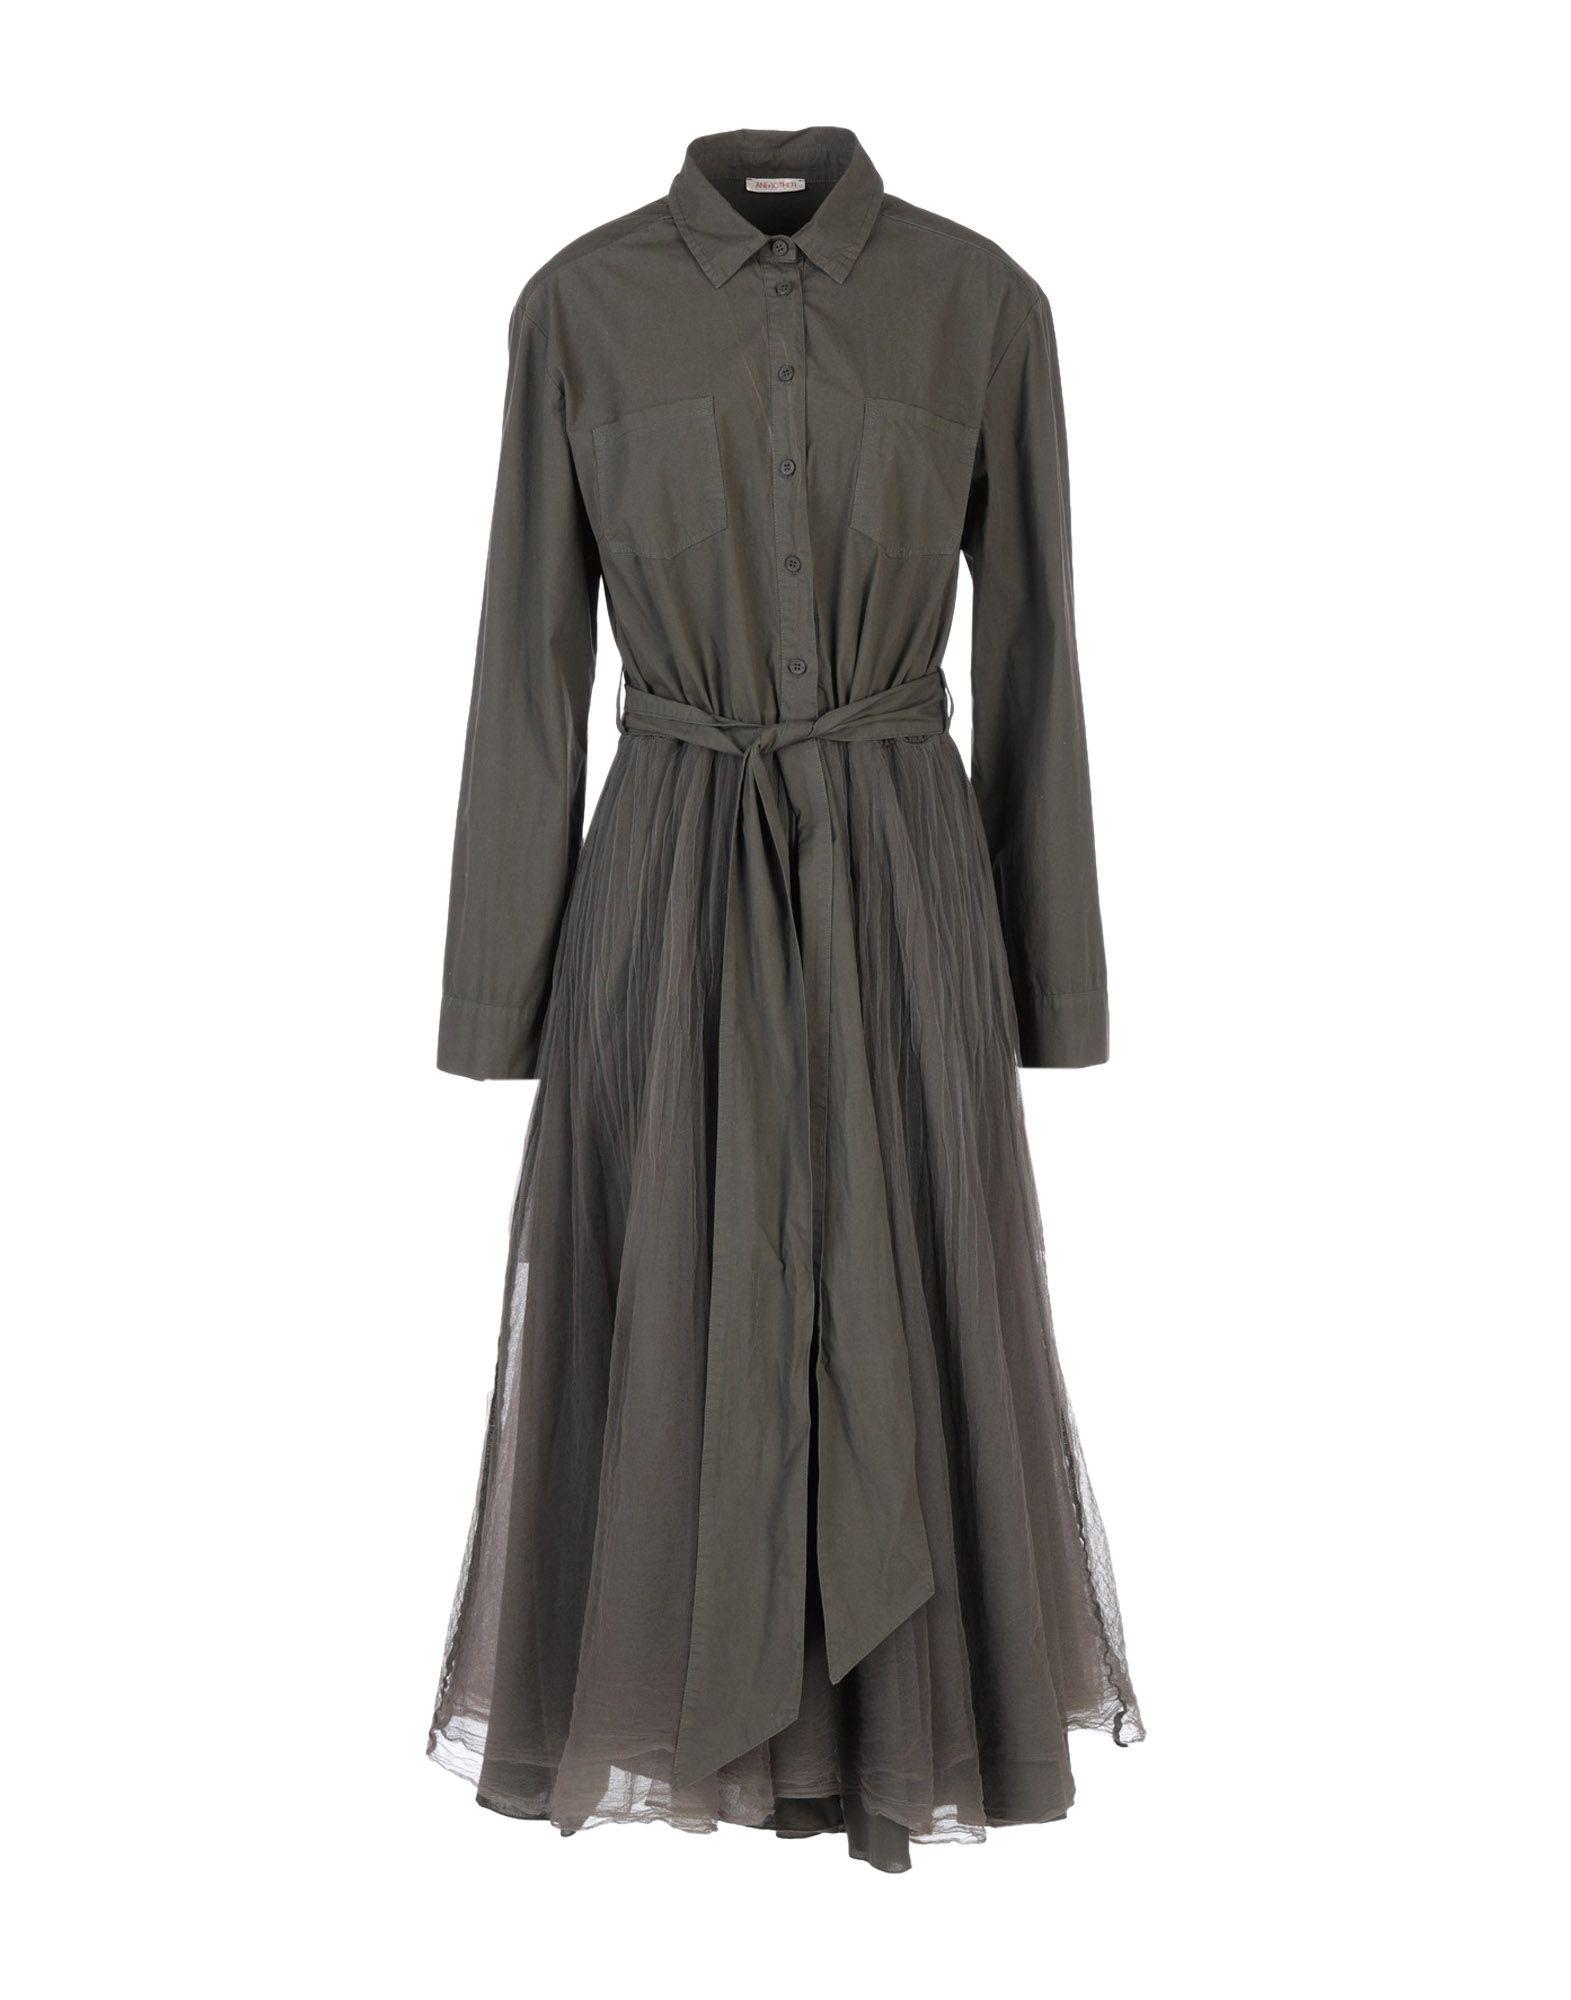 AN(+)OTHER Платье длиной 3/4 other tamehome 2015 1 4 hifi